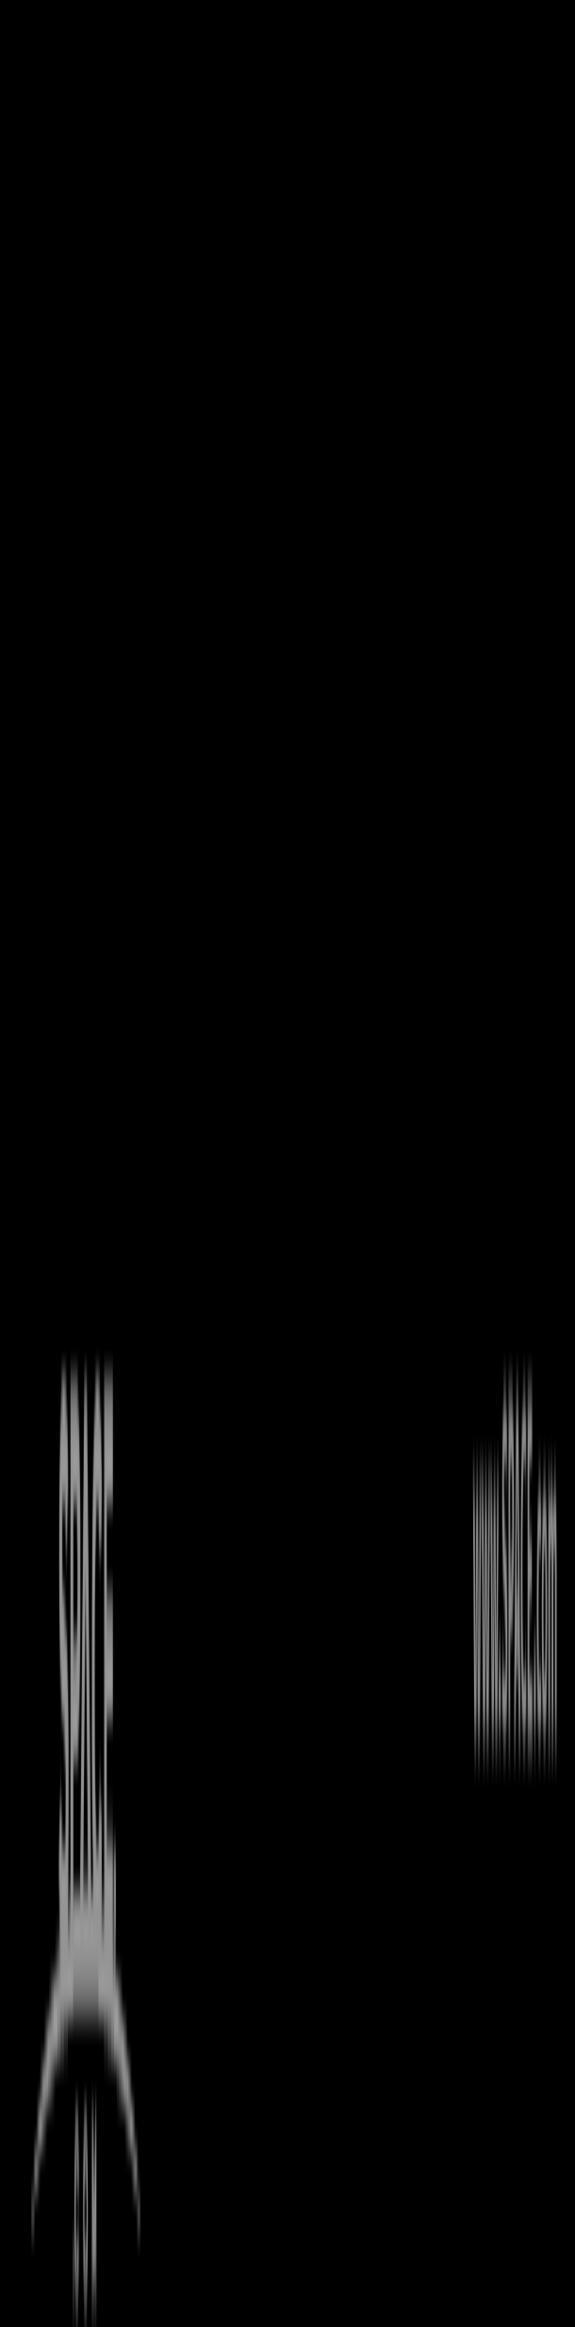 "NASA's Juno spacecraft to study Jupiter like never before. <a href=""http://www.space.com/12472-juno-probe-spacecraft-jupiter-nasa.html"" rel=""nofollow noopener"" target=""_blank"" data-ylk=""slk:See how NASA's latest Jupiter probe works"" class=""link rapid-noclick-resp"">See how NASA's latest Jupiter probe works</a>."